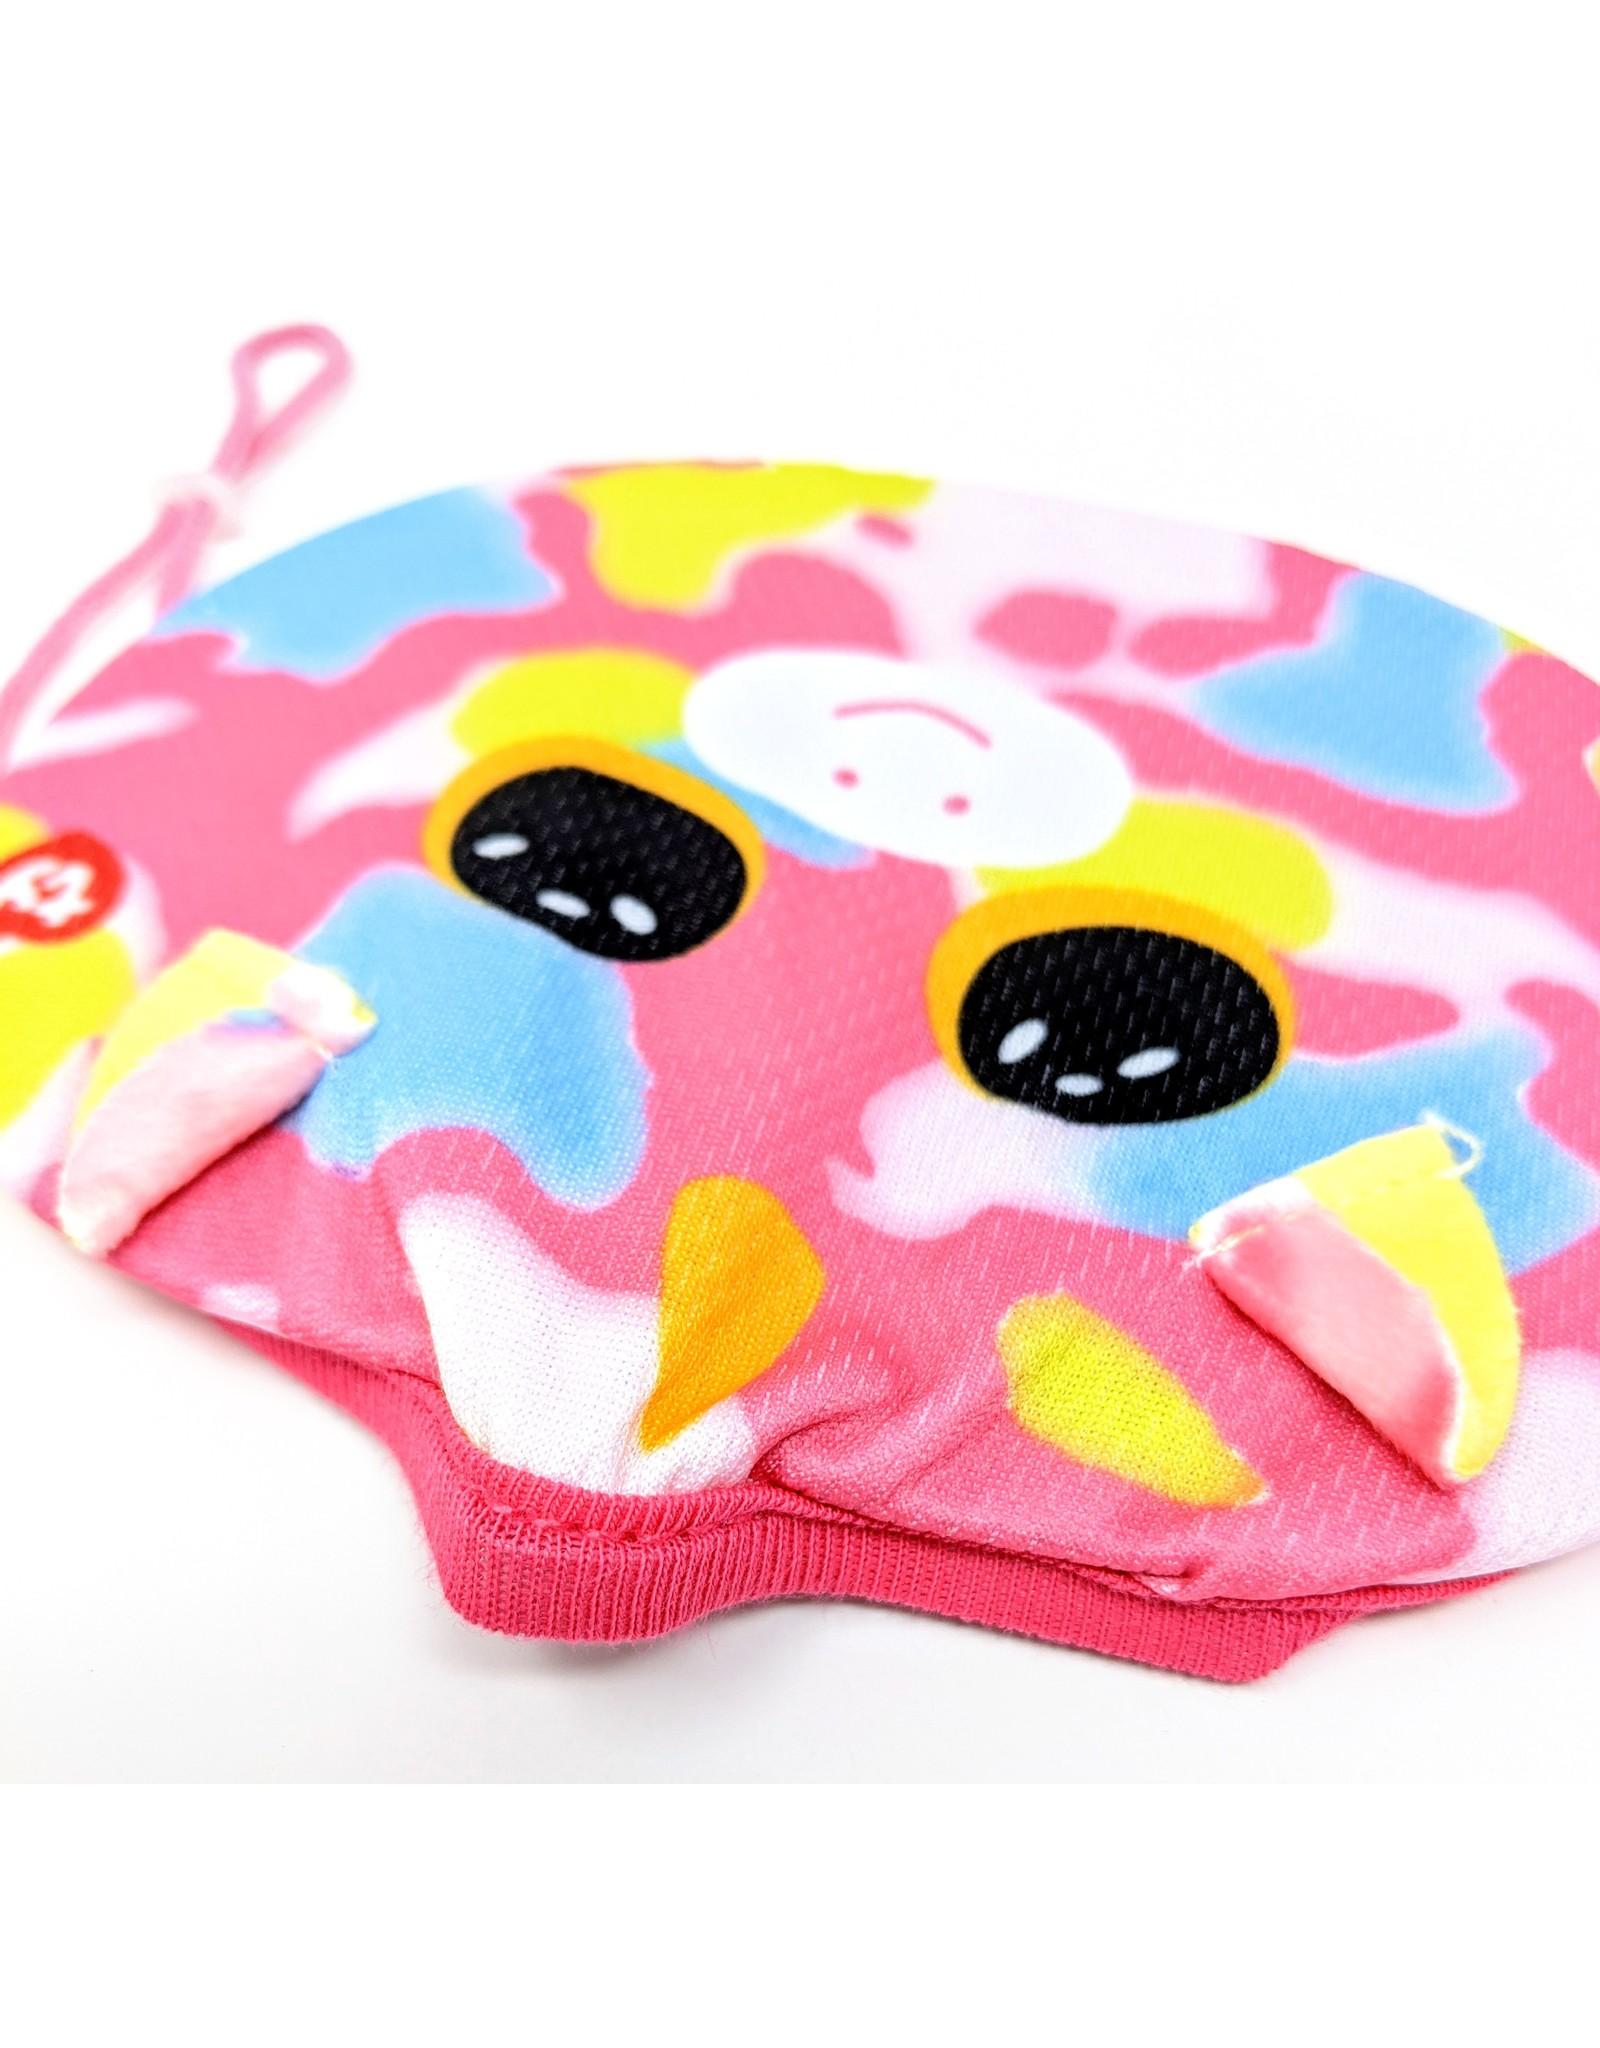 TY Face Mask Beanie Boo - Fantasia